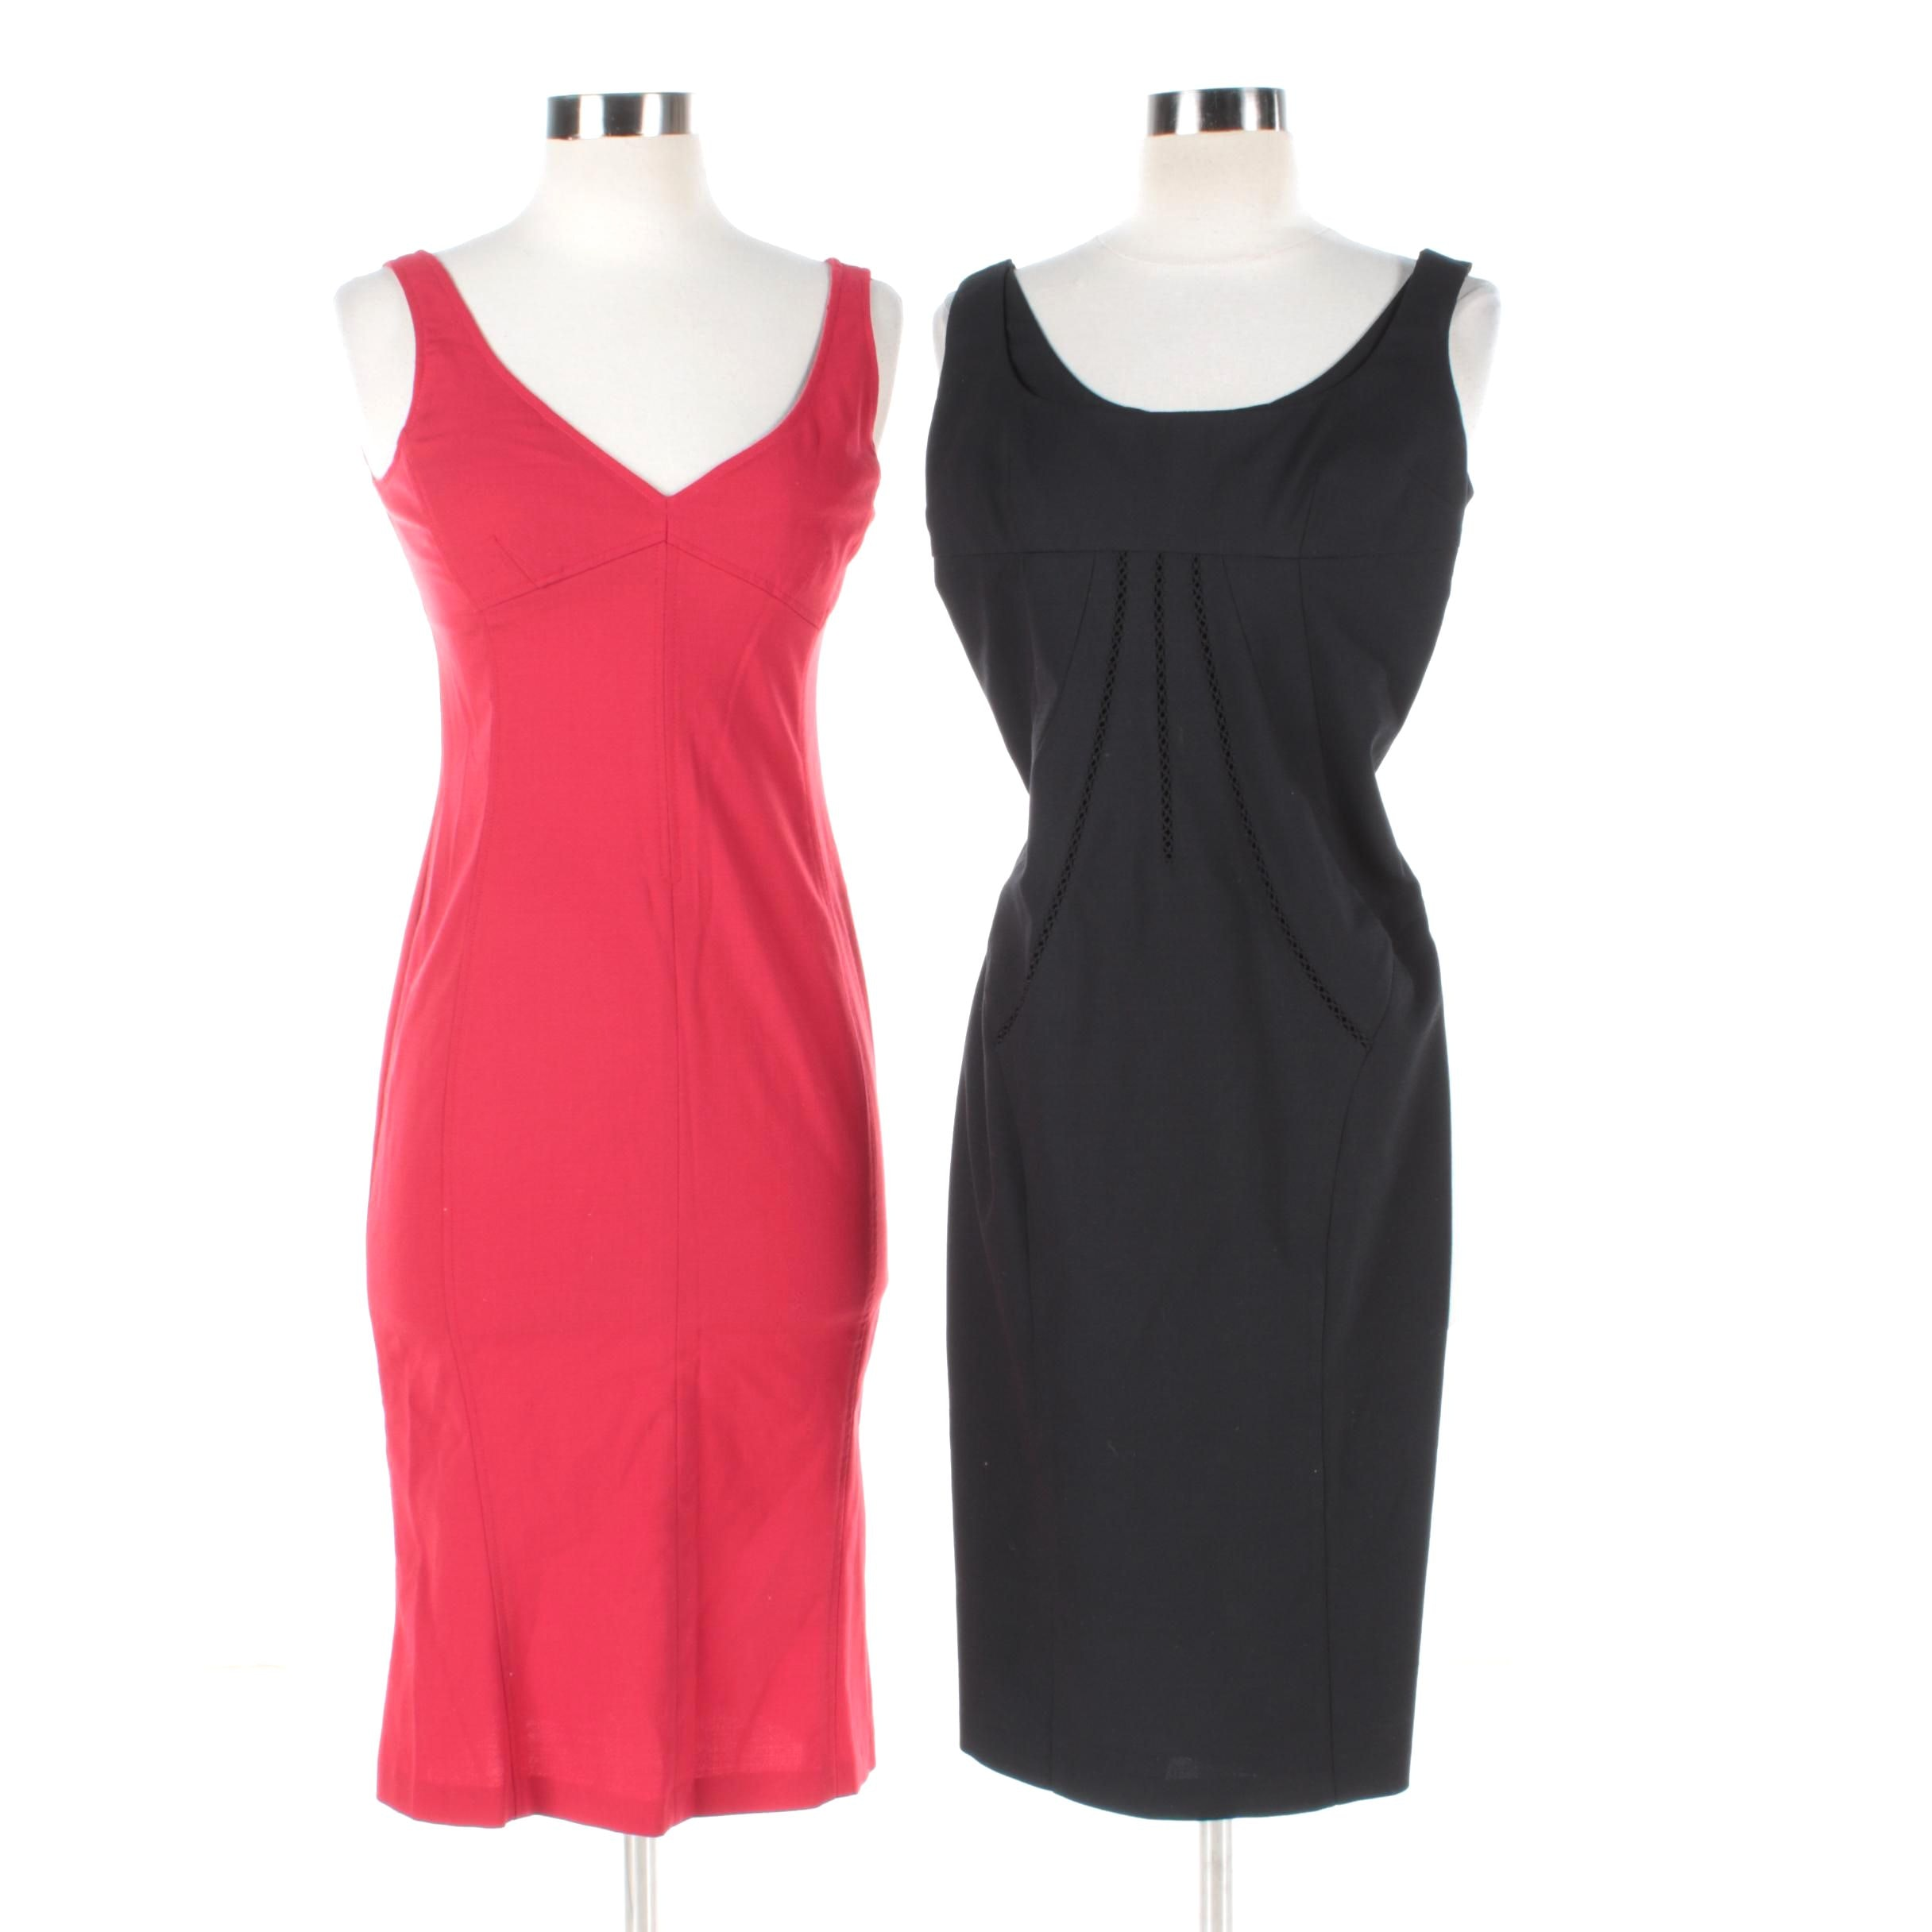 Women's Dolce & Gabbana Sleeveless Dresses